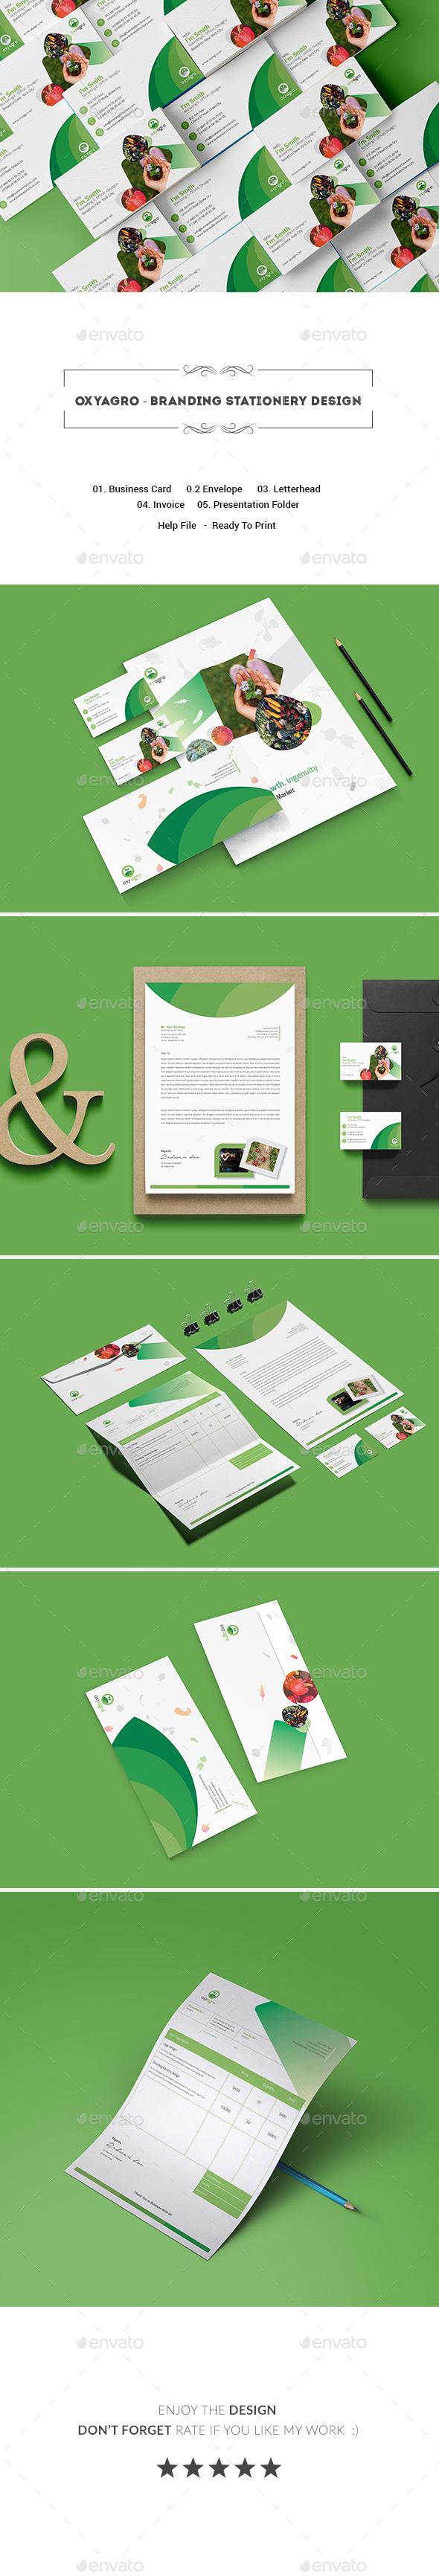 Oxyagro - Branding Stationary Design - Stationery Print Templates